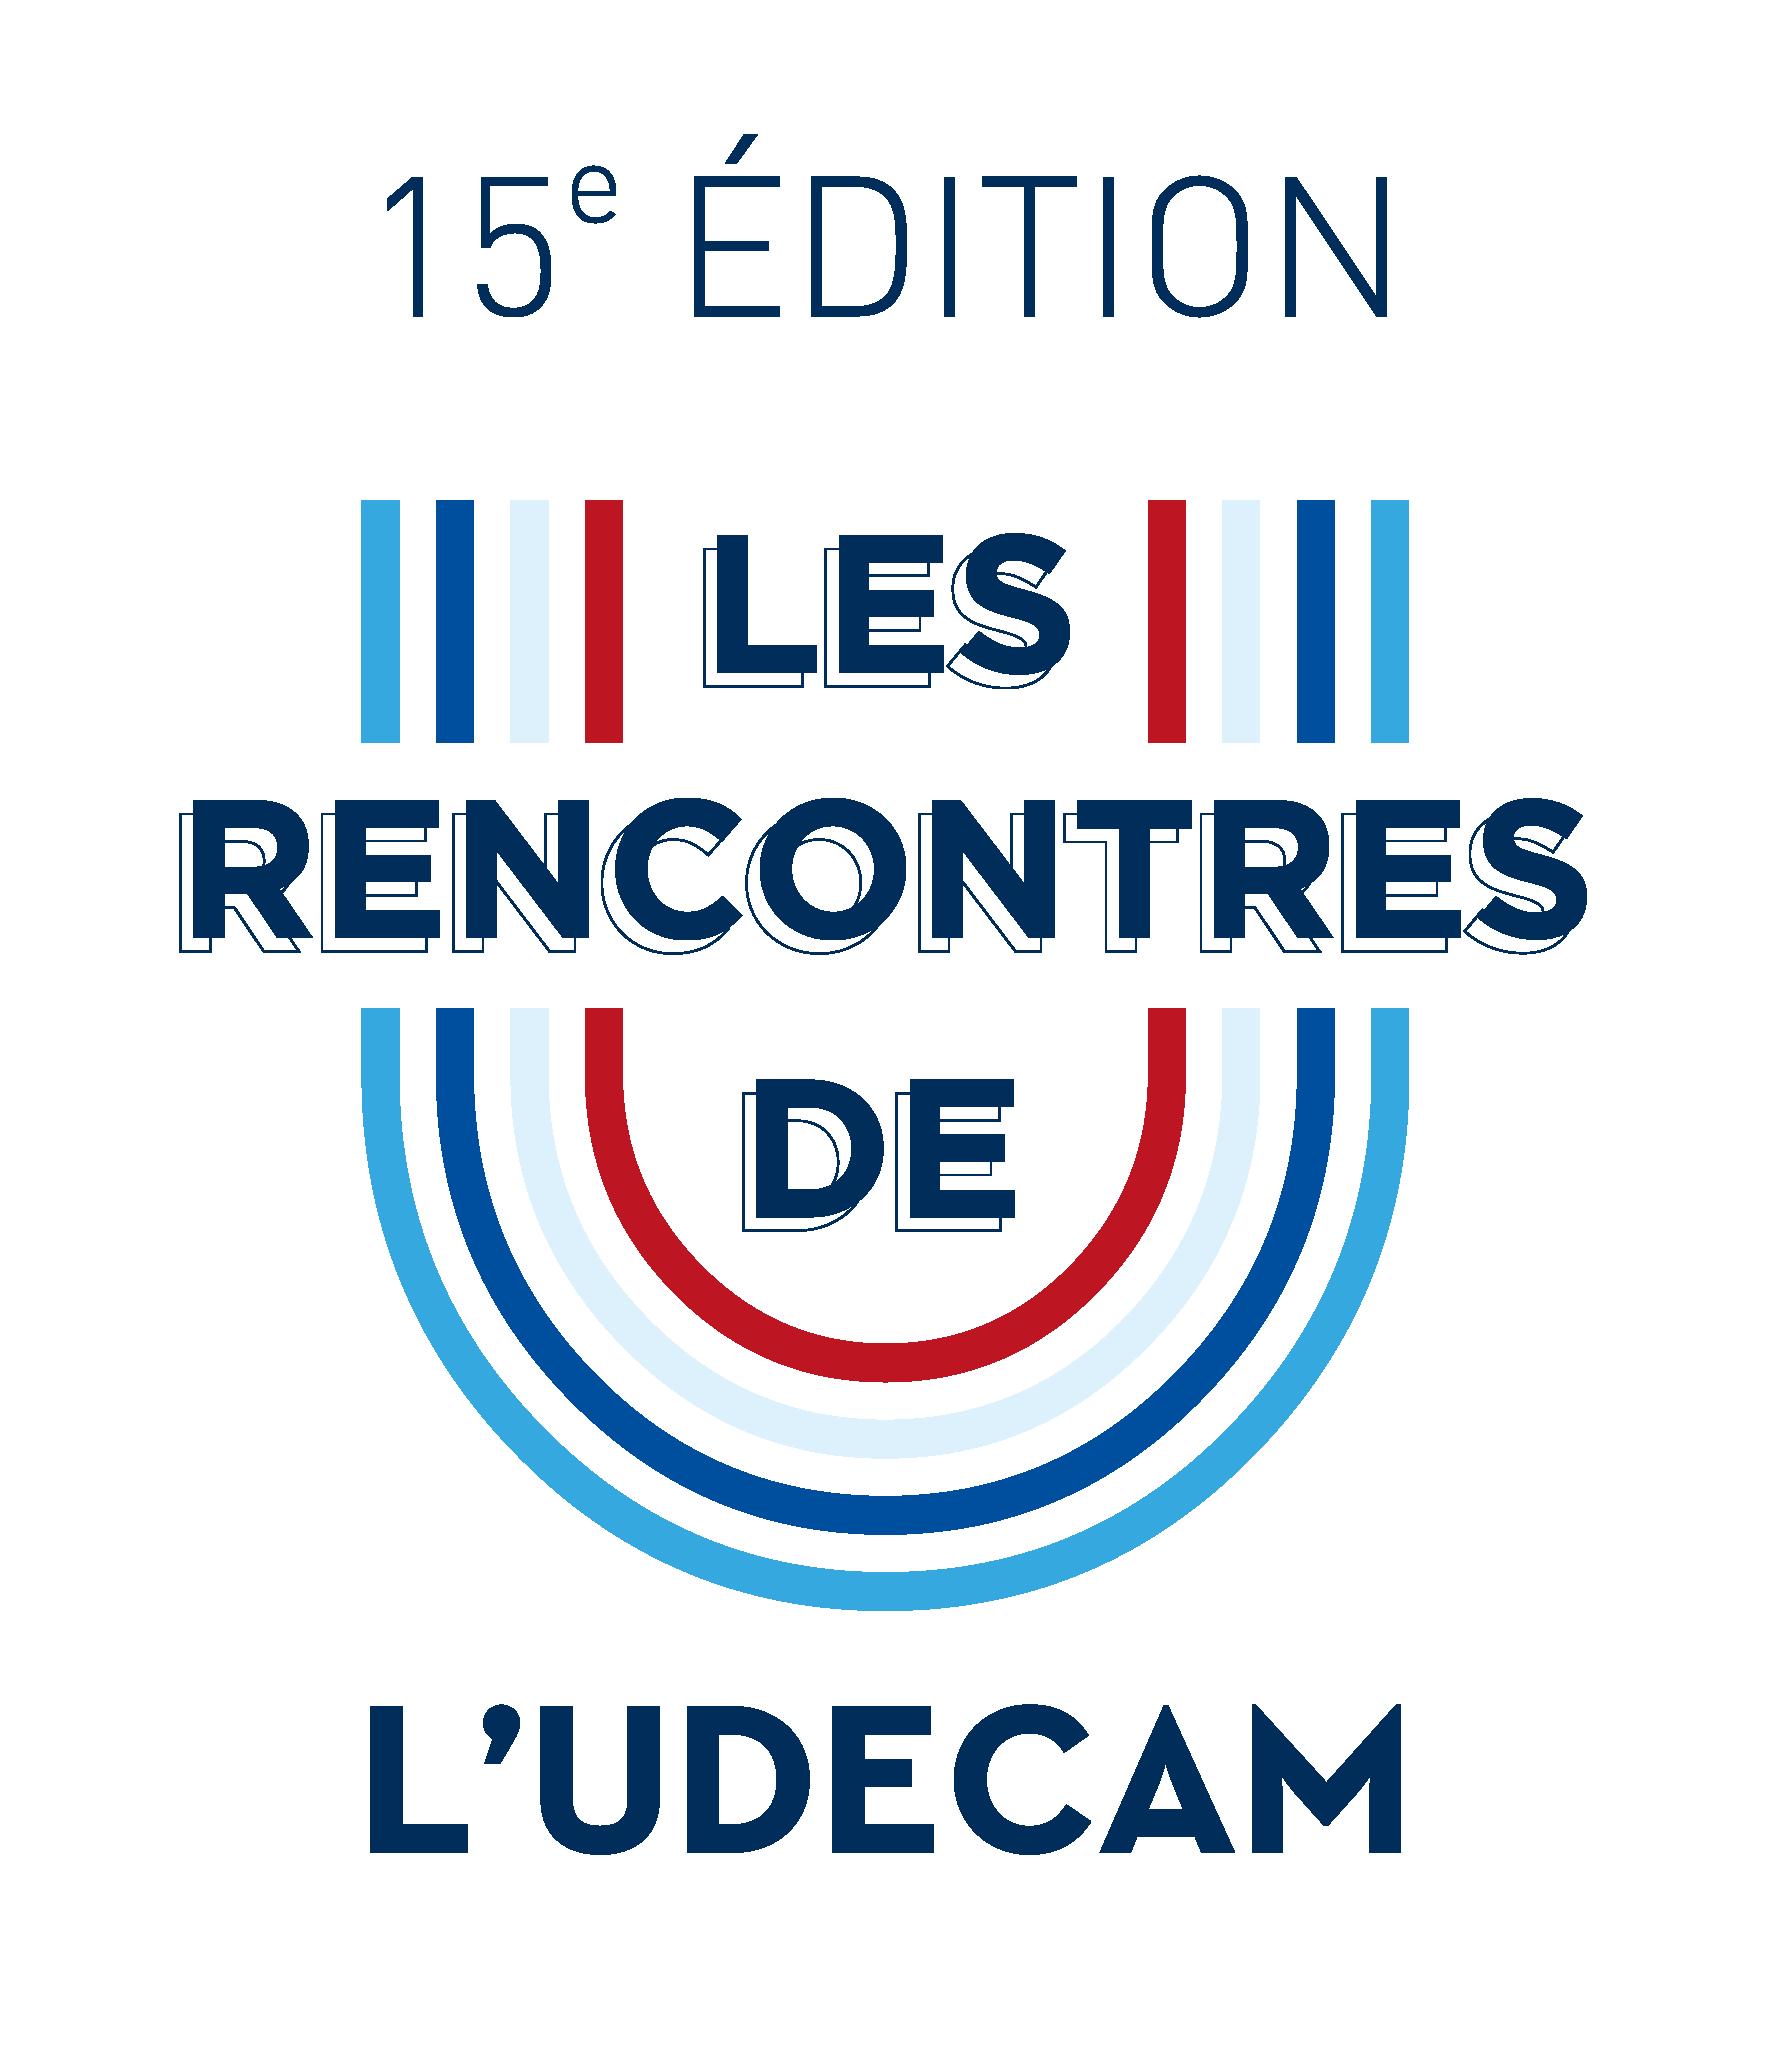 Les Rencontres de l'Udecam 2021